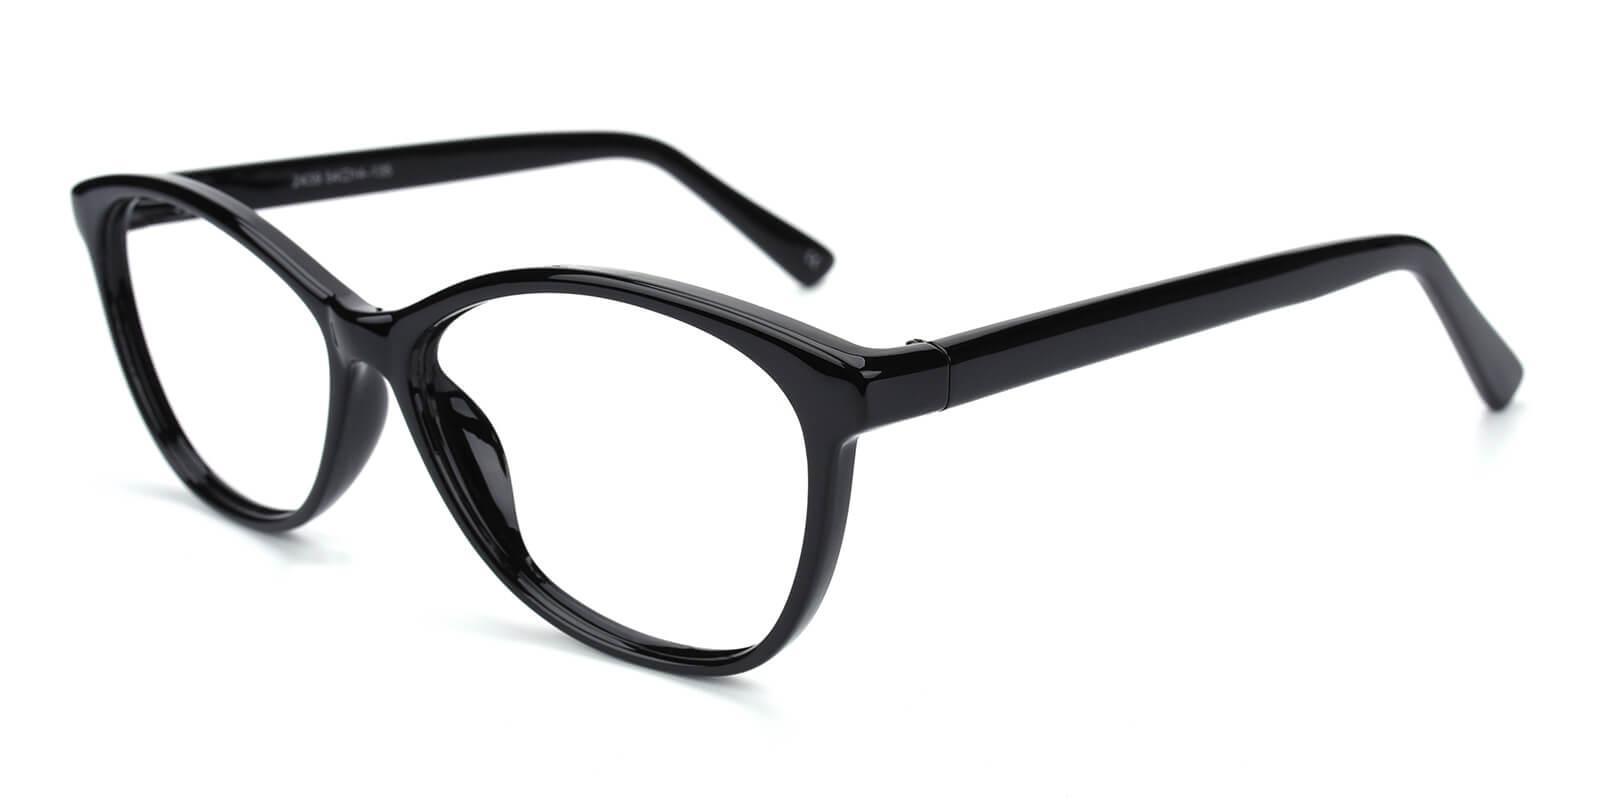 Netfertari-Black-Cat-Plastic-Eyeglasses-additional1